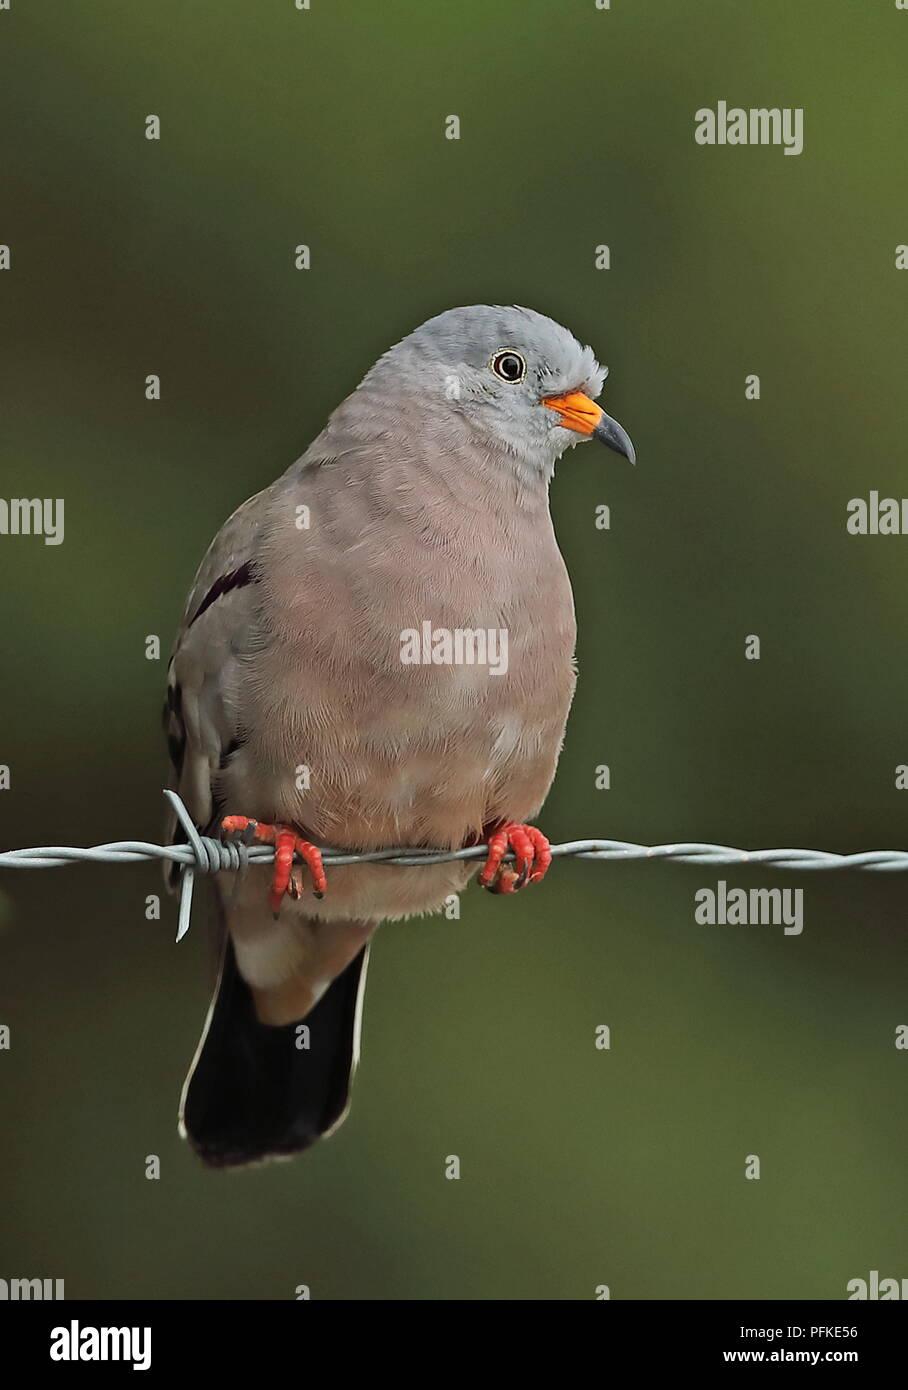 Croaking Ground-dove (Columbina cruziana) adult male perched on barbed wire fence  Loja, Ecuador                        February - Stock Image